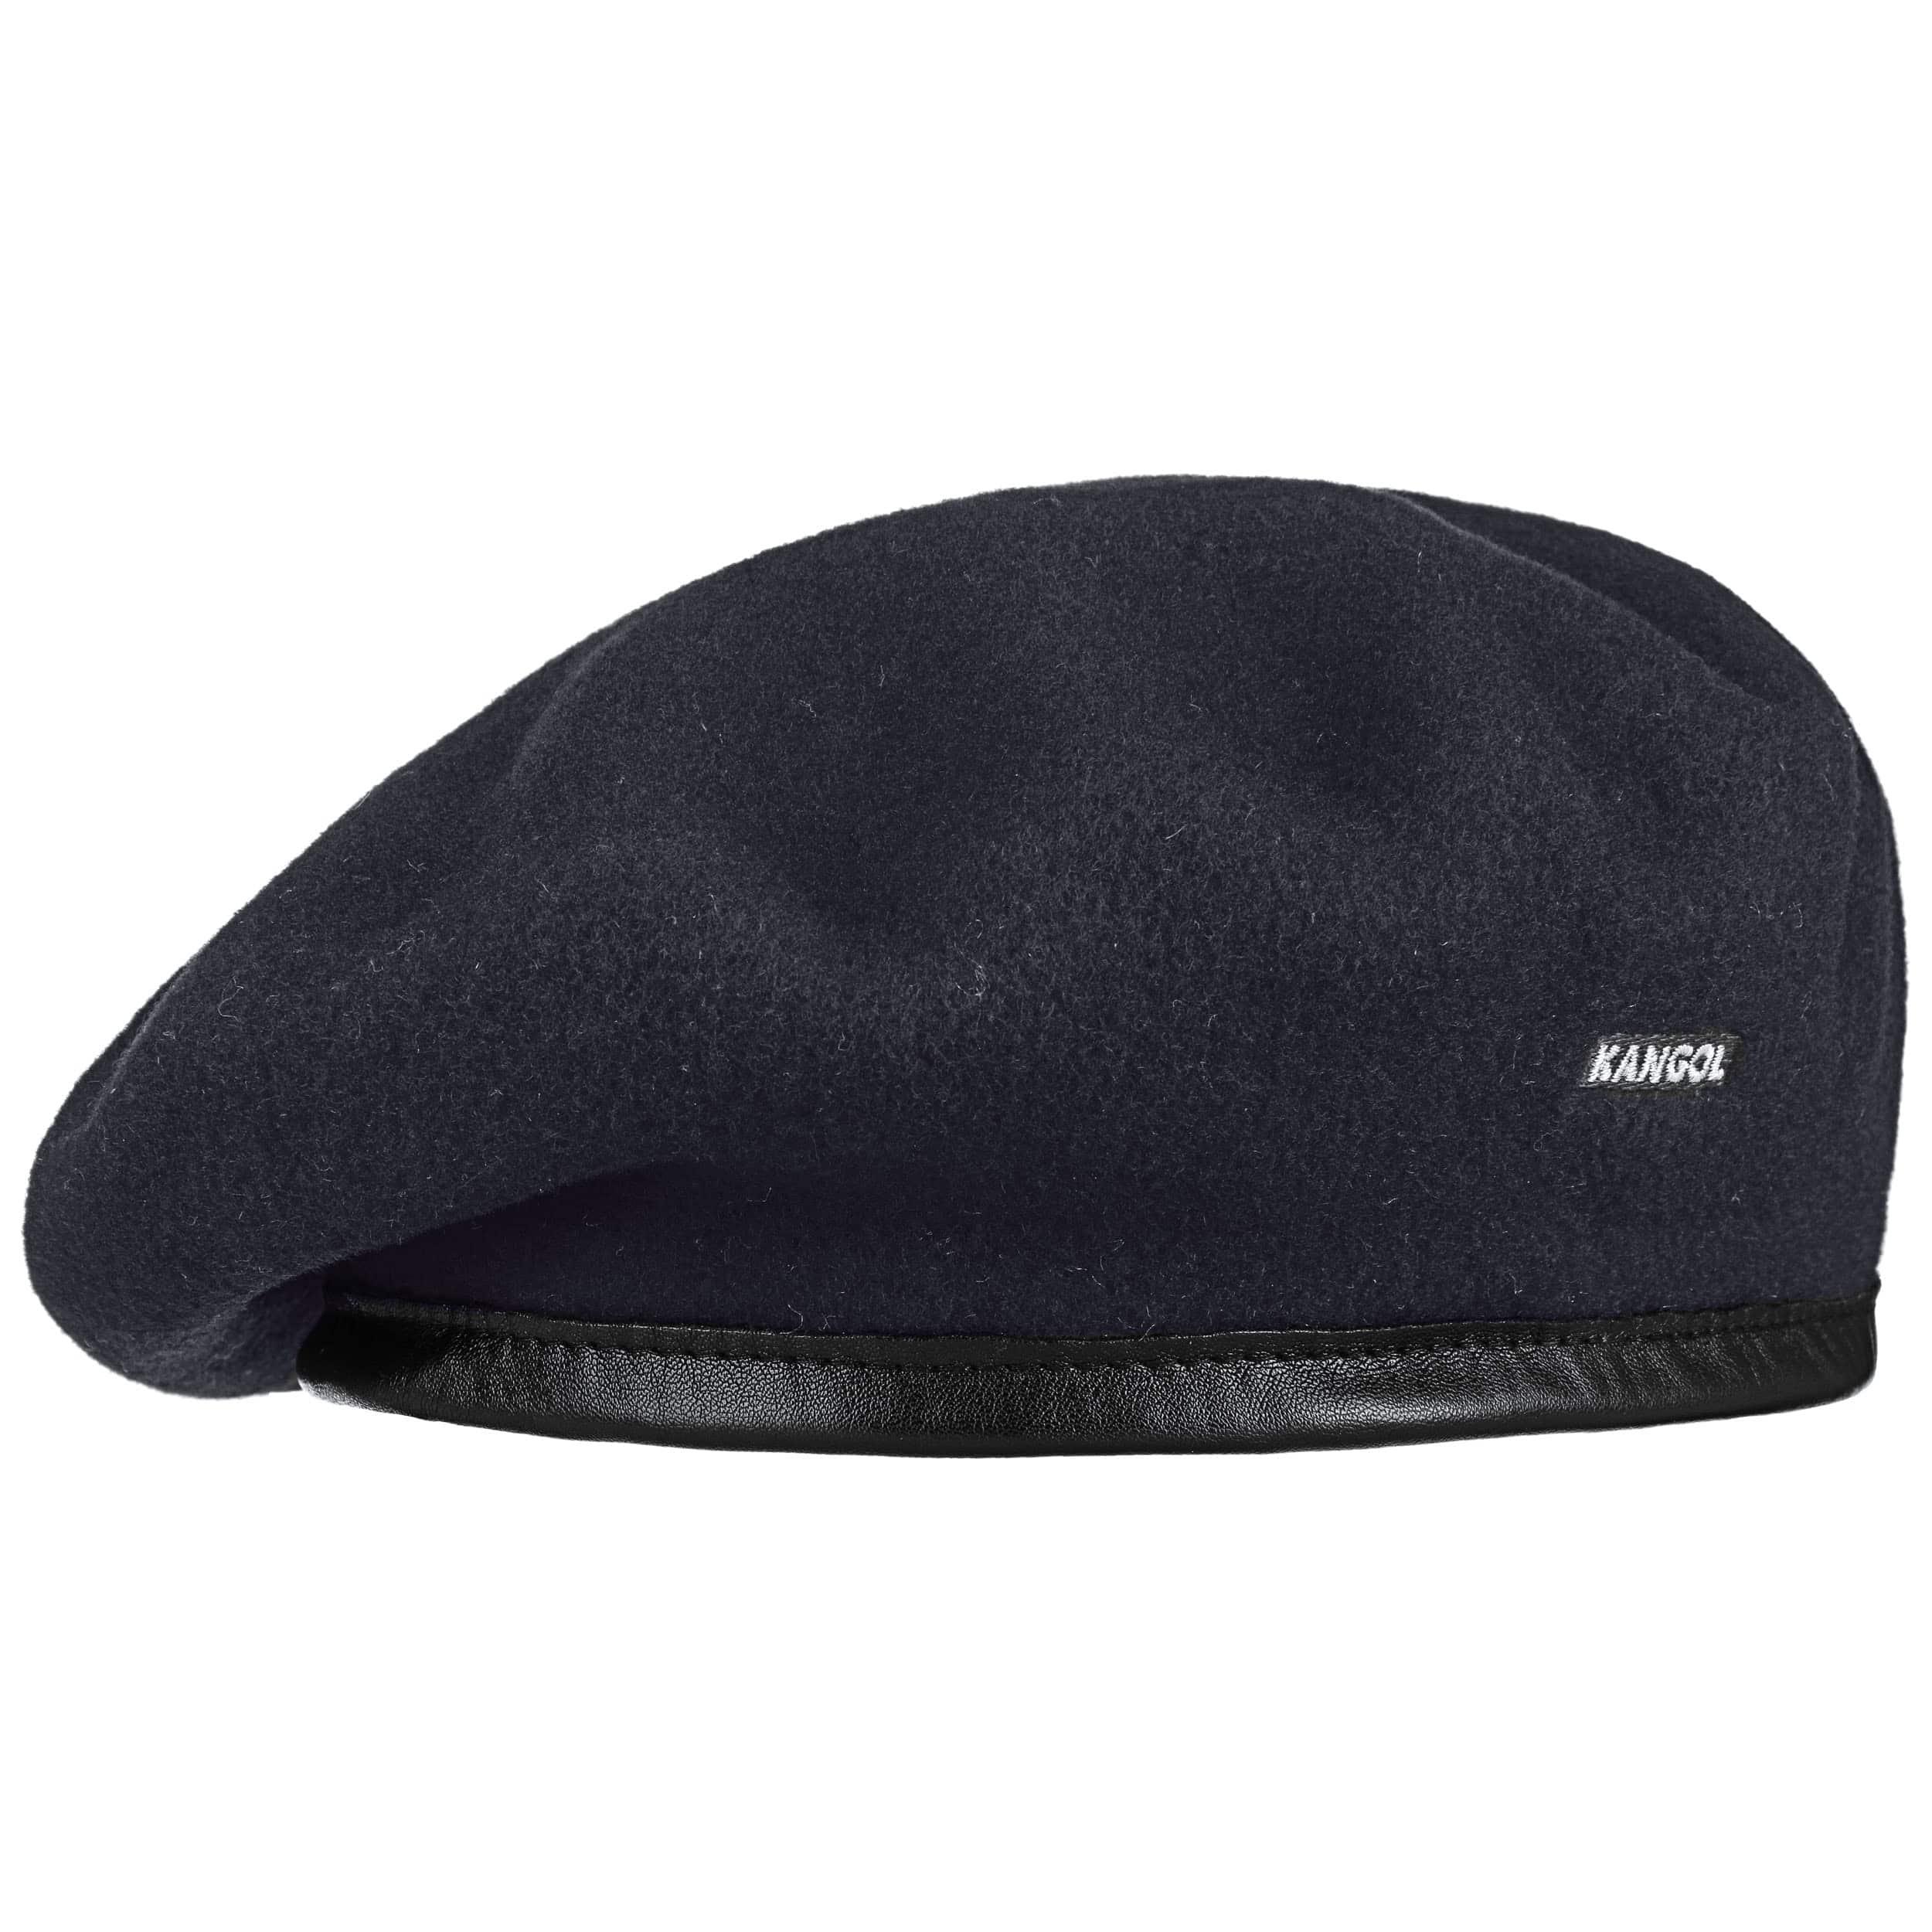 6b44fd2b8159b Boina Vasca Kangol Monty - Gorros - sombreroshop.es